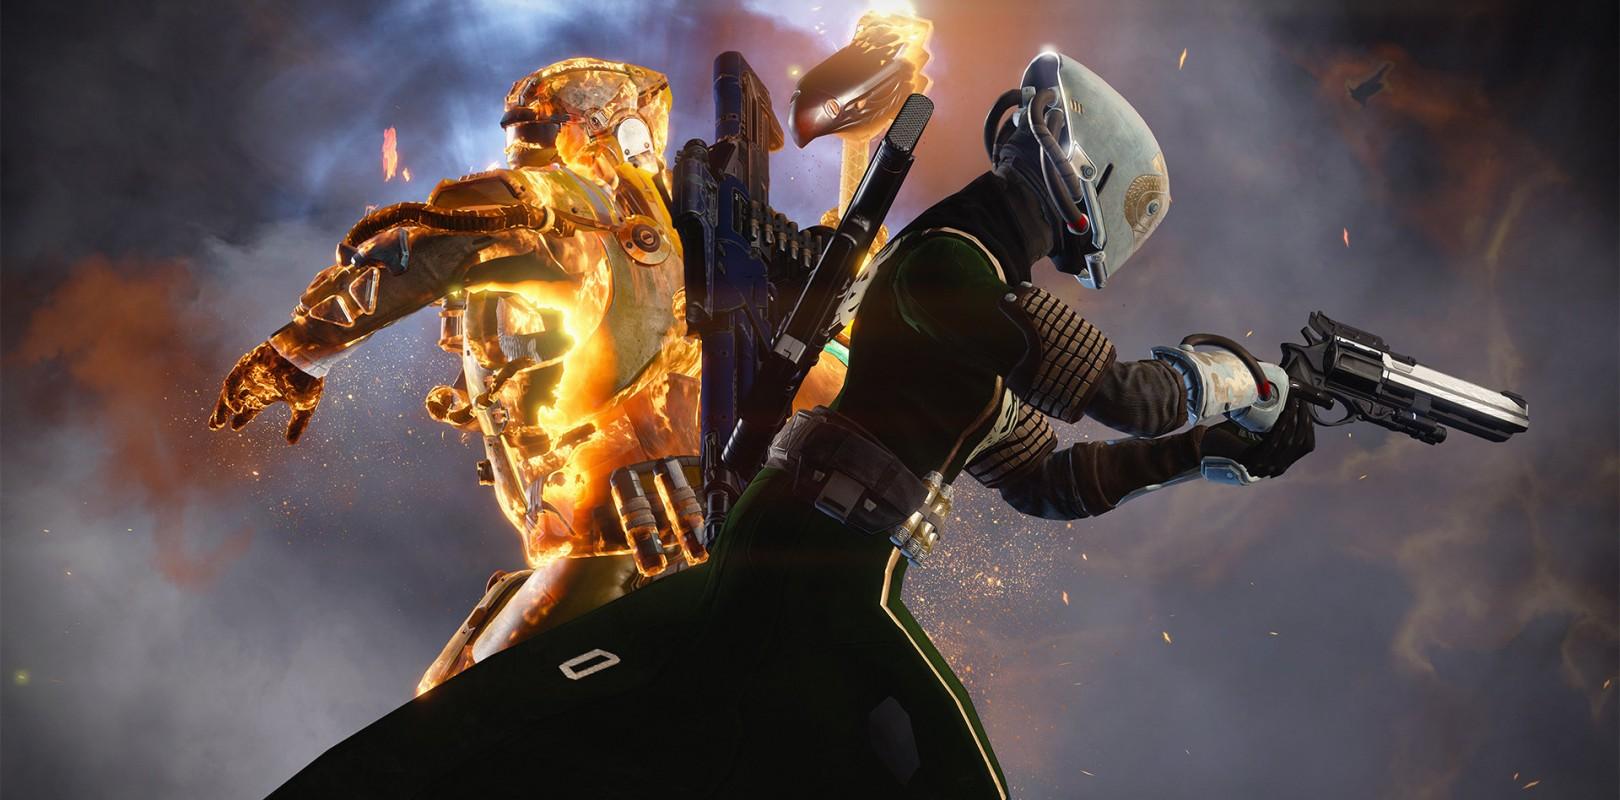 Destiny - The Taken King Twitch Stream Overview